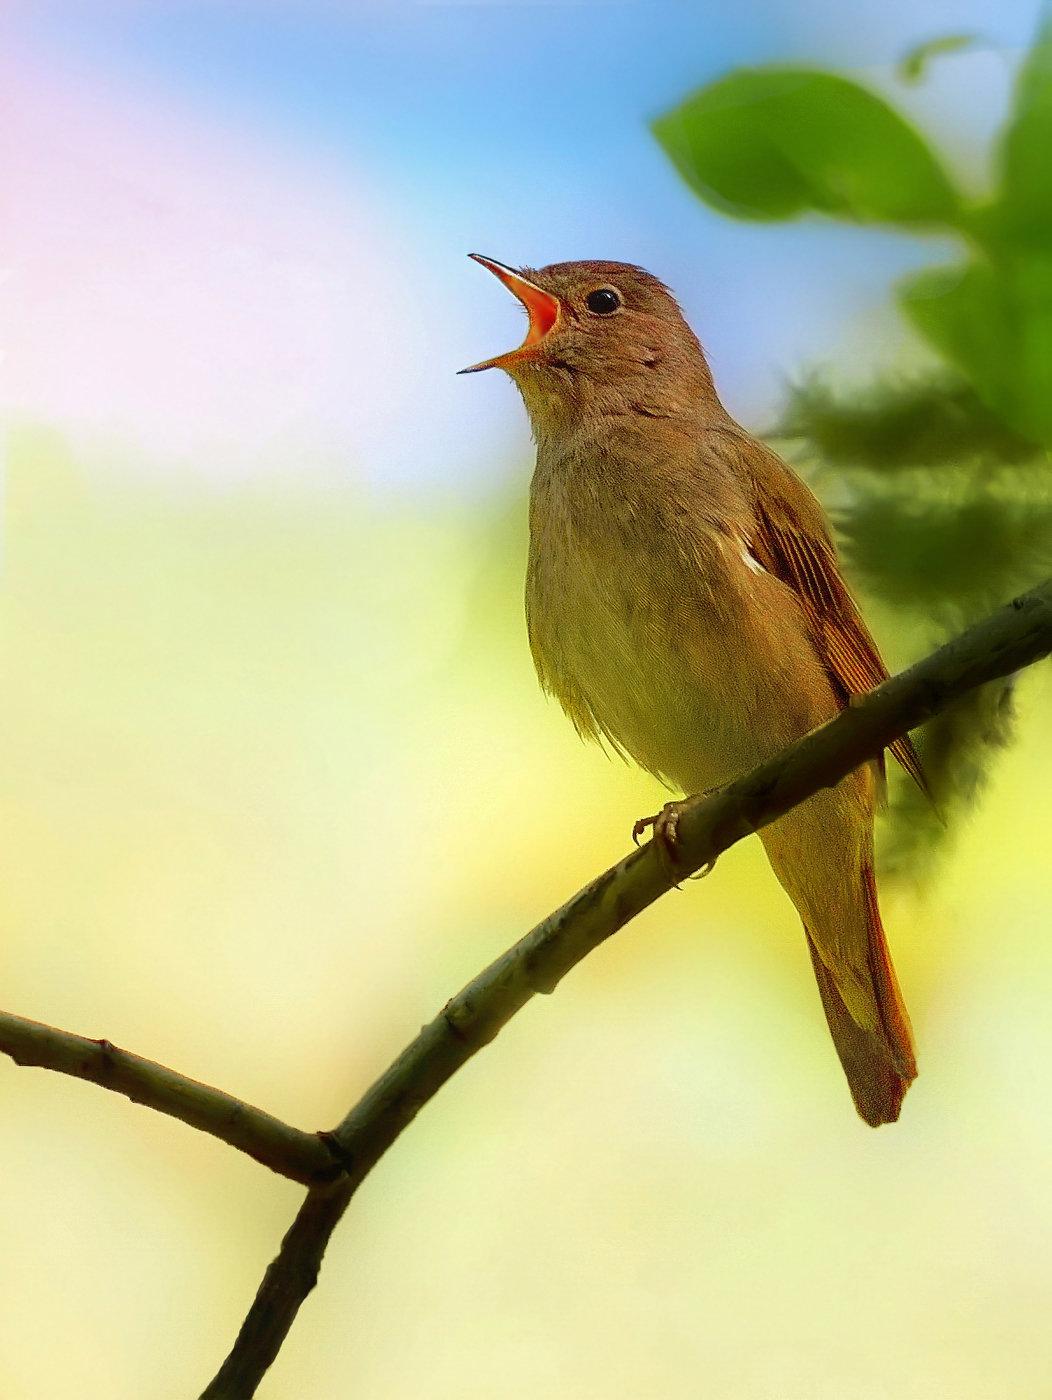 звуки российских птиц позировала штурвала